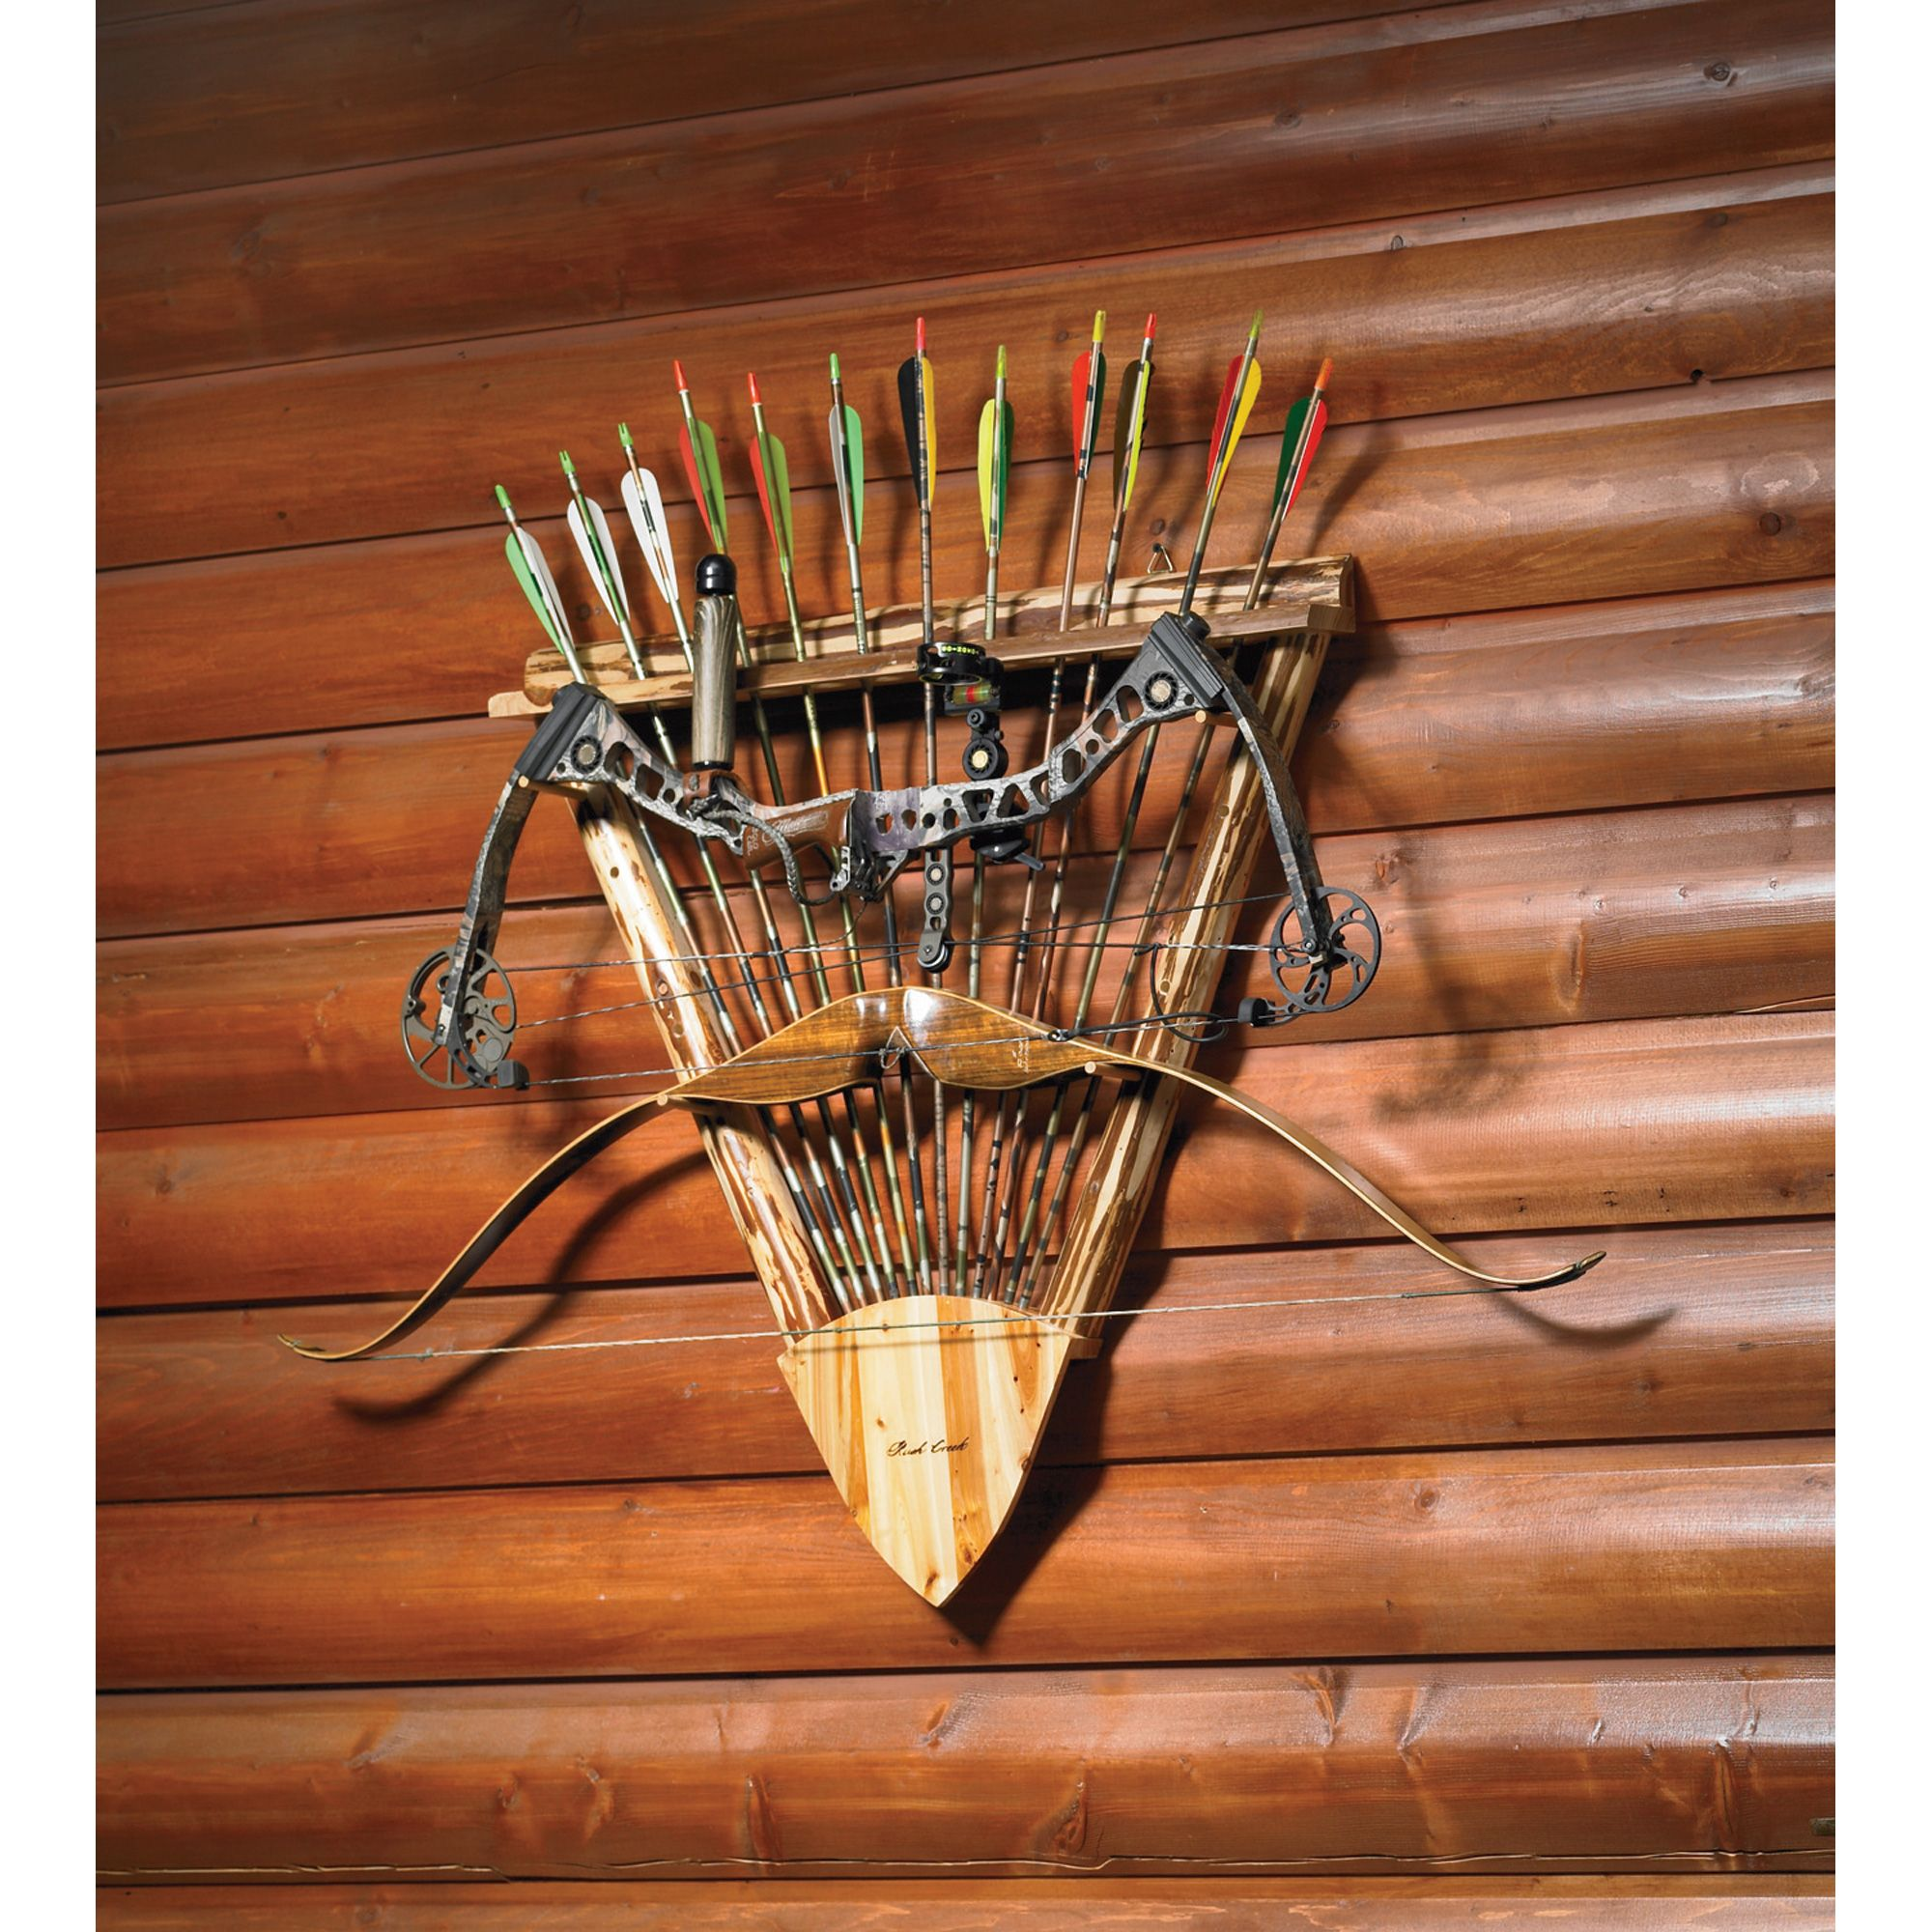 Rush Creek Log Wooden Hunting Archery Gear Bow /& Arrow Wall Rack Storage Display